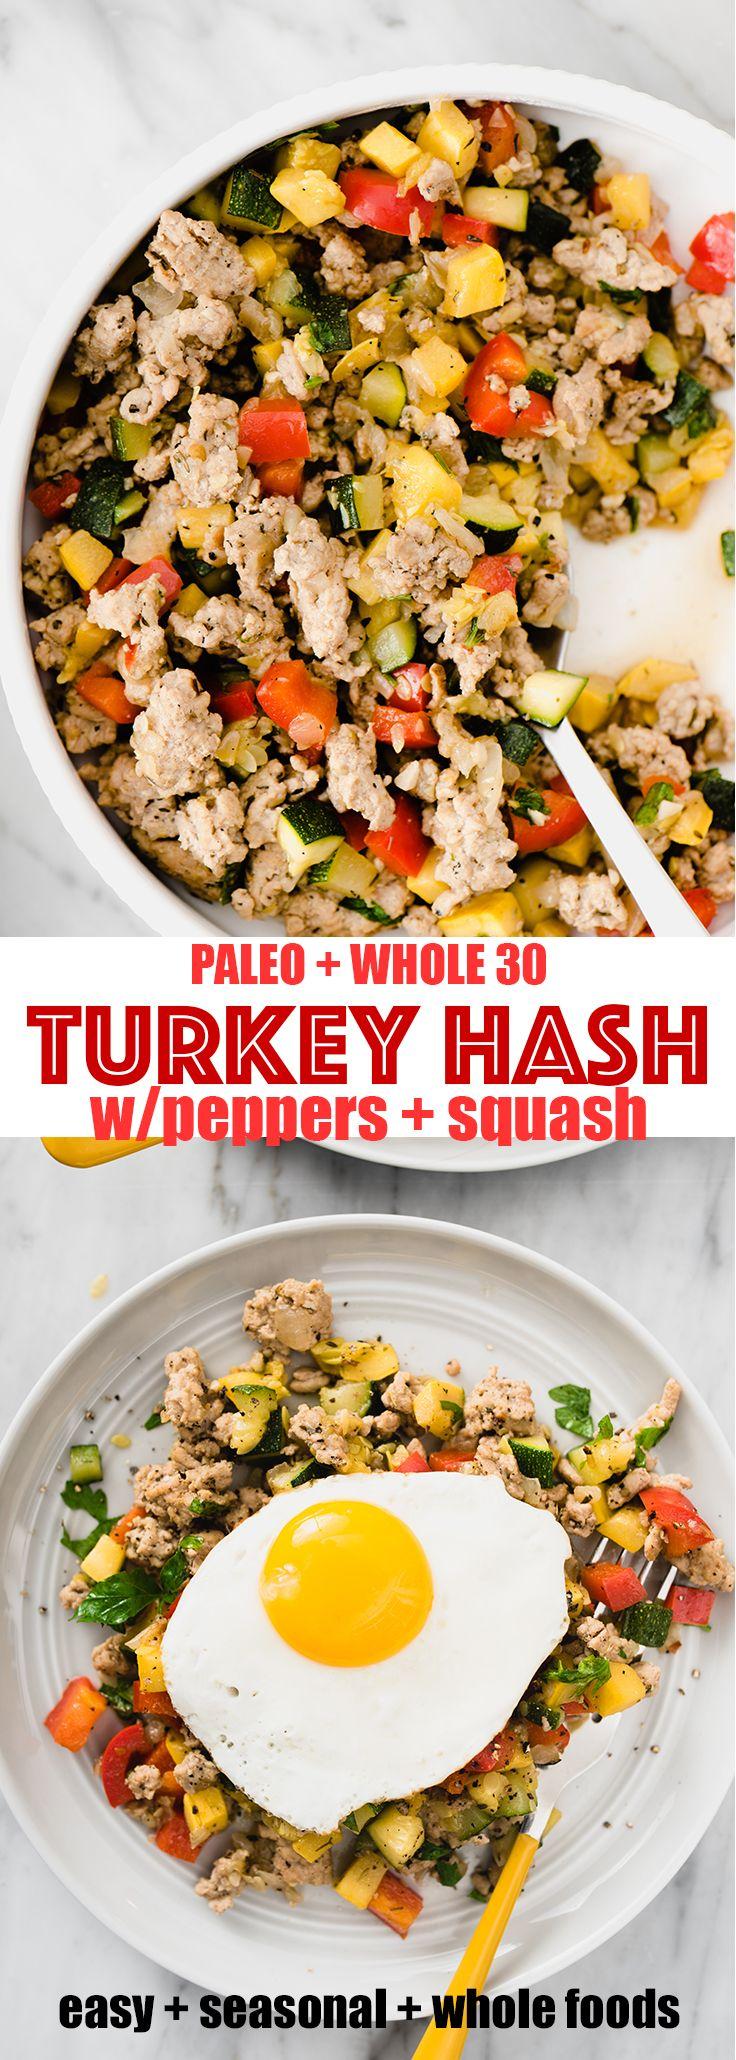 Ground turkey hash. I added sweet potato as well.